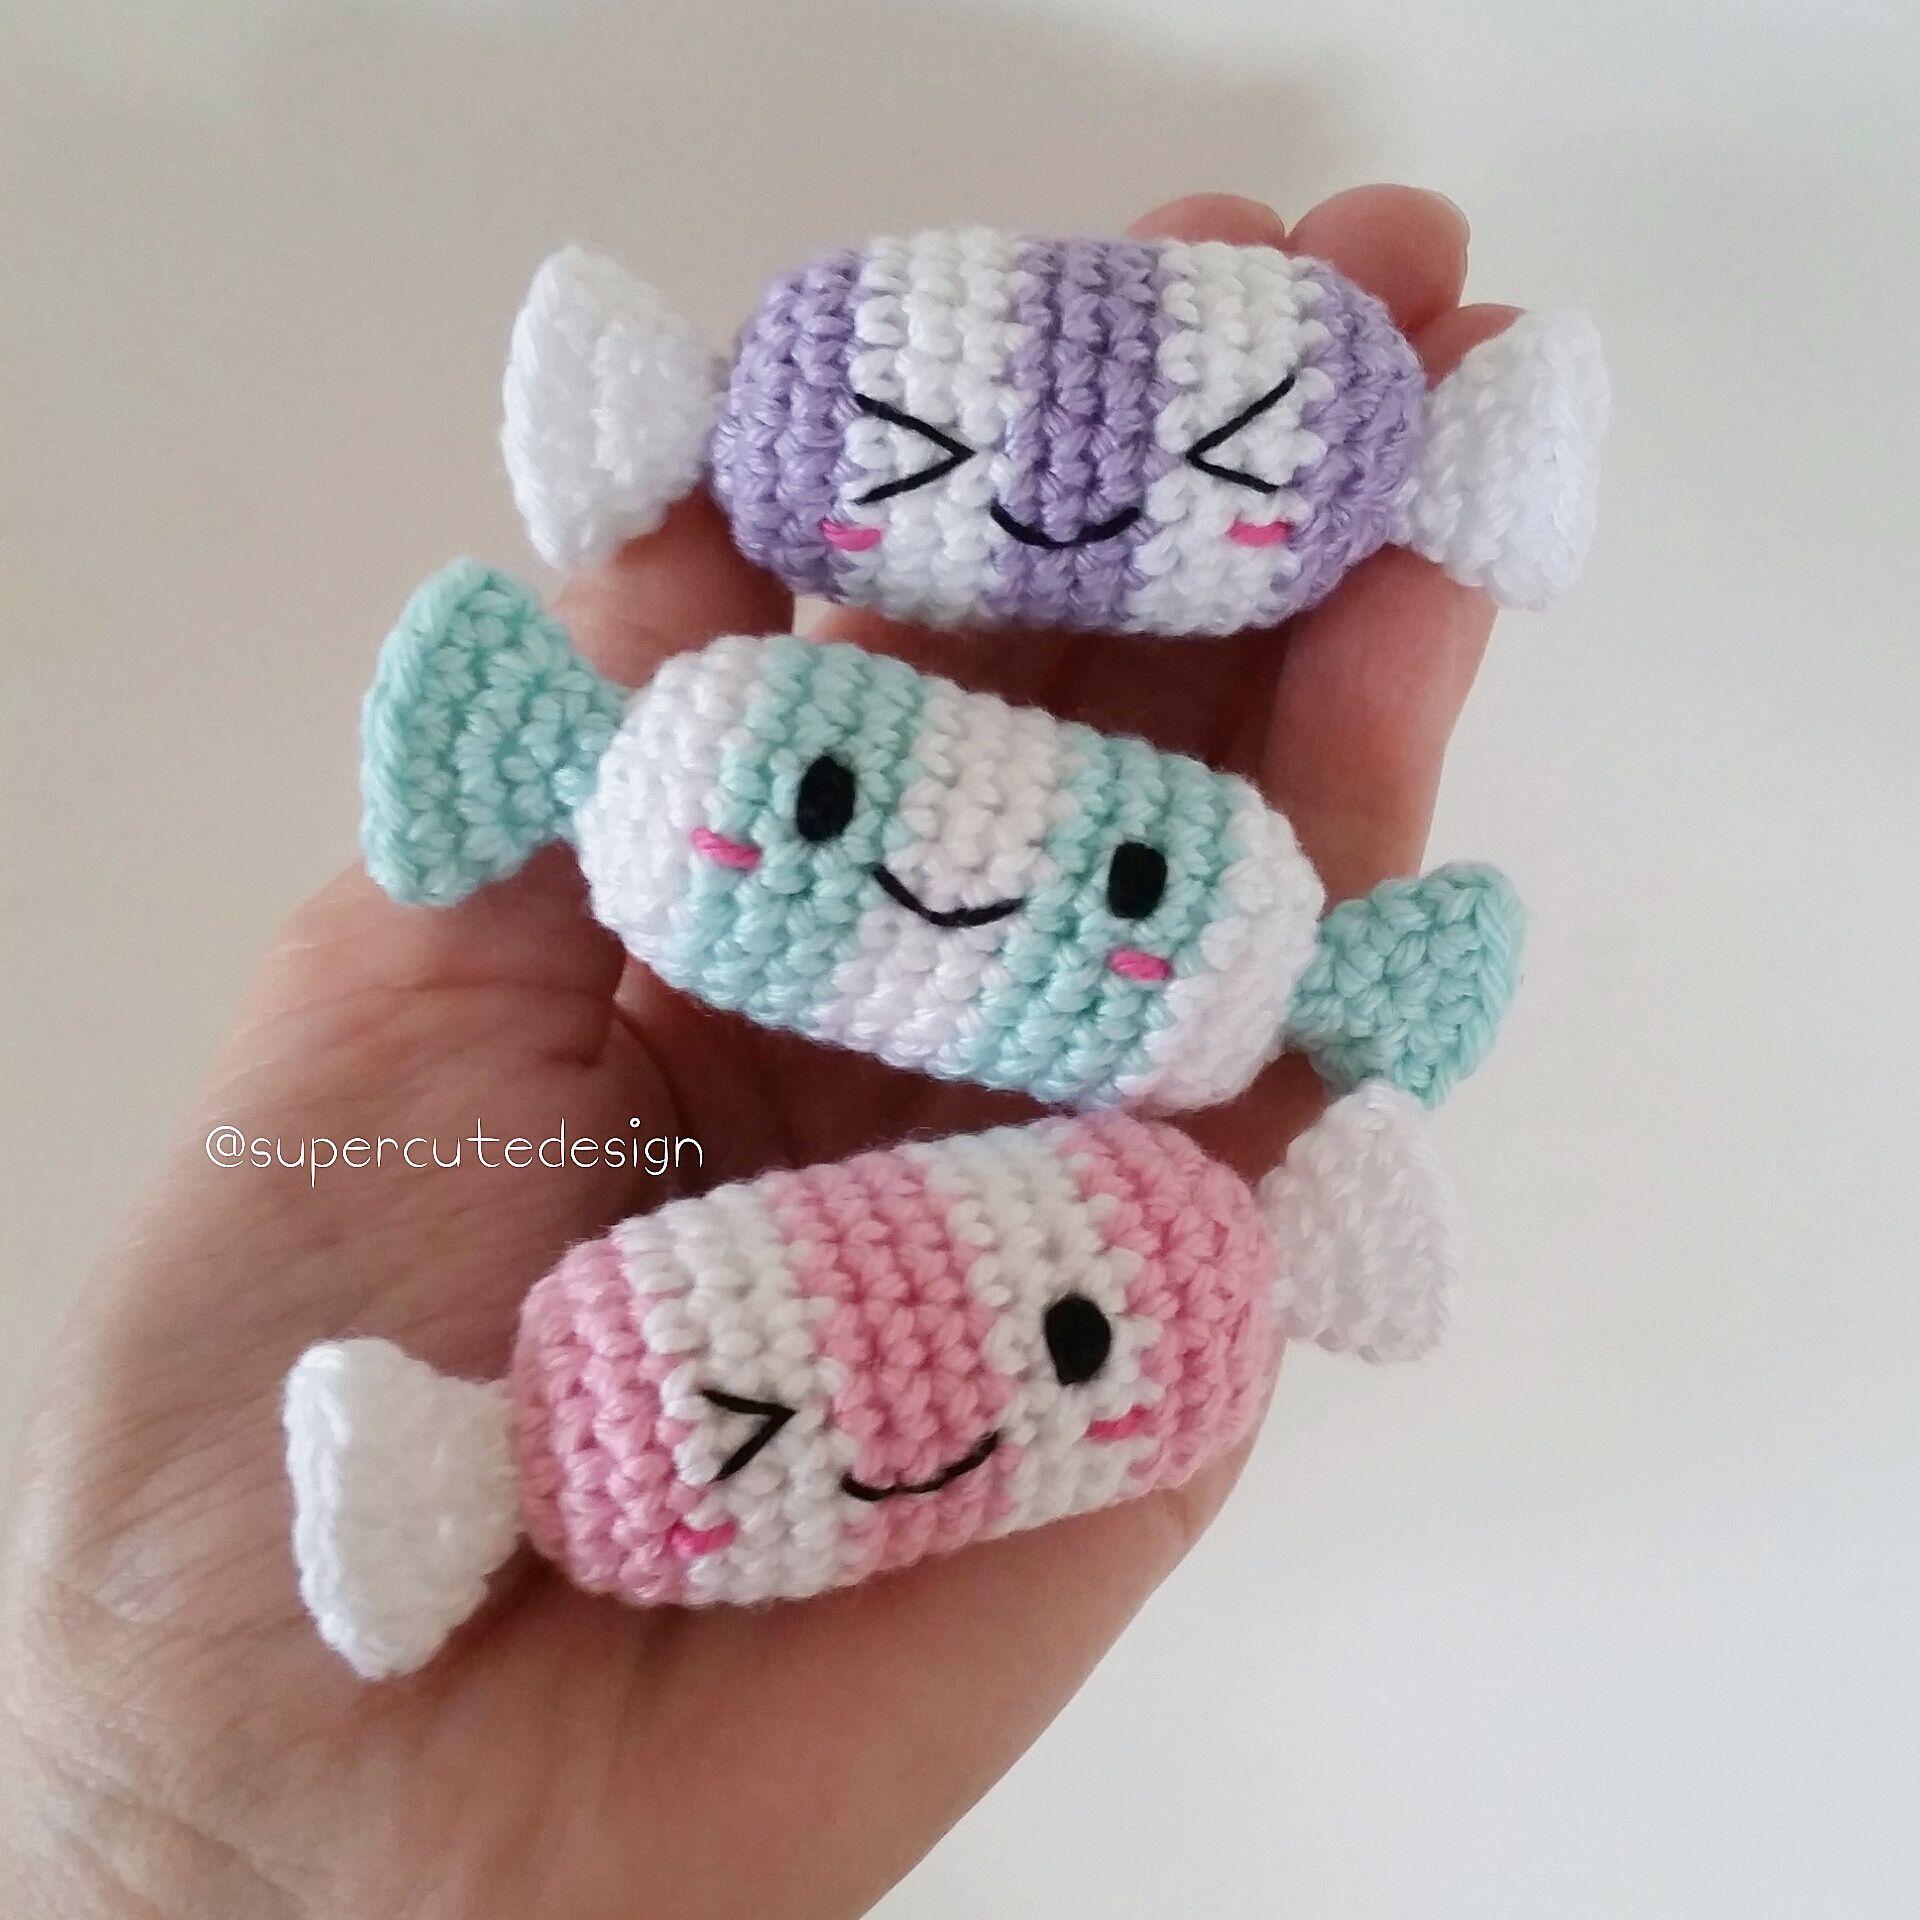 CANDY pattern | SUPER CUTE DESIGN | Crochet | Pinterest | Amigurumi ...